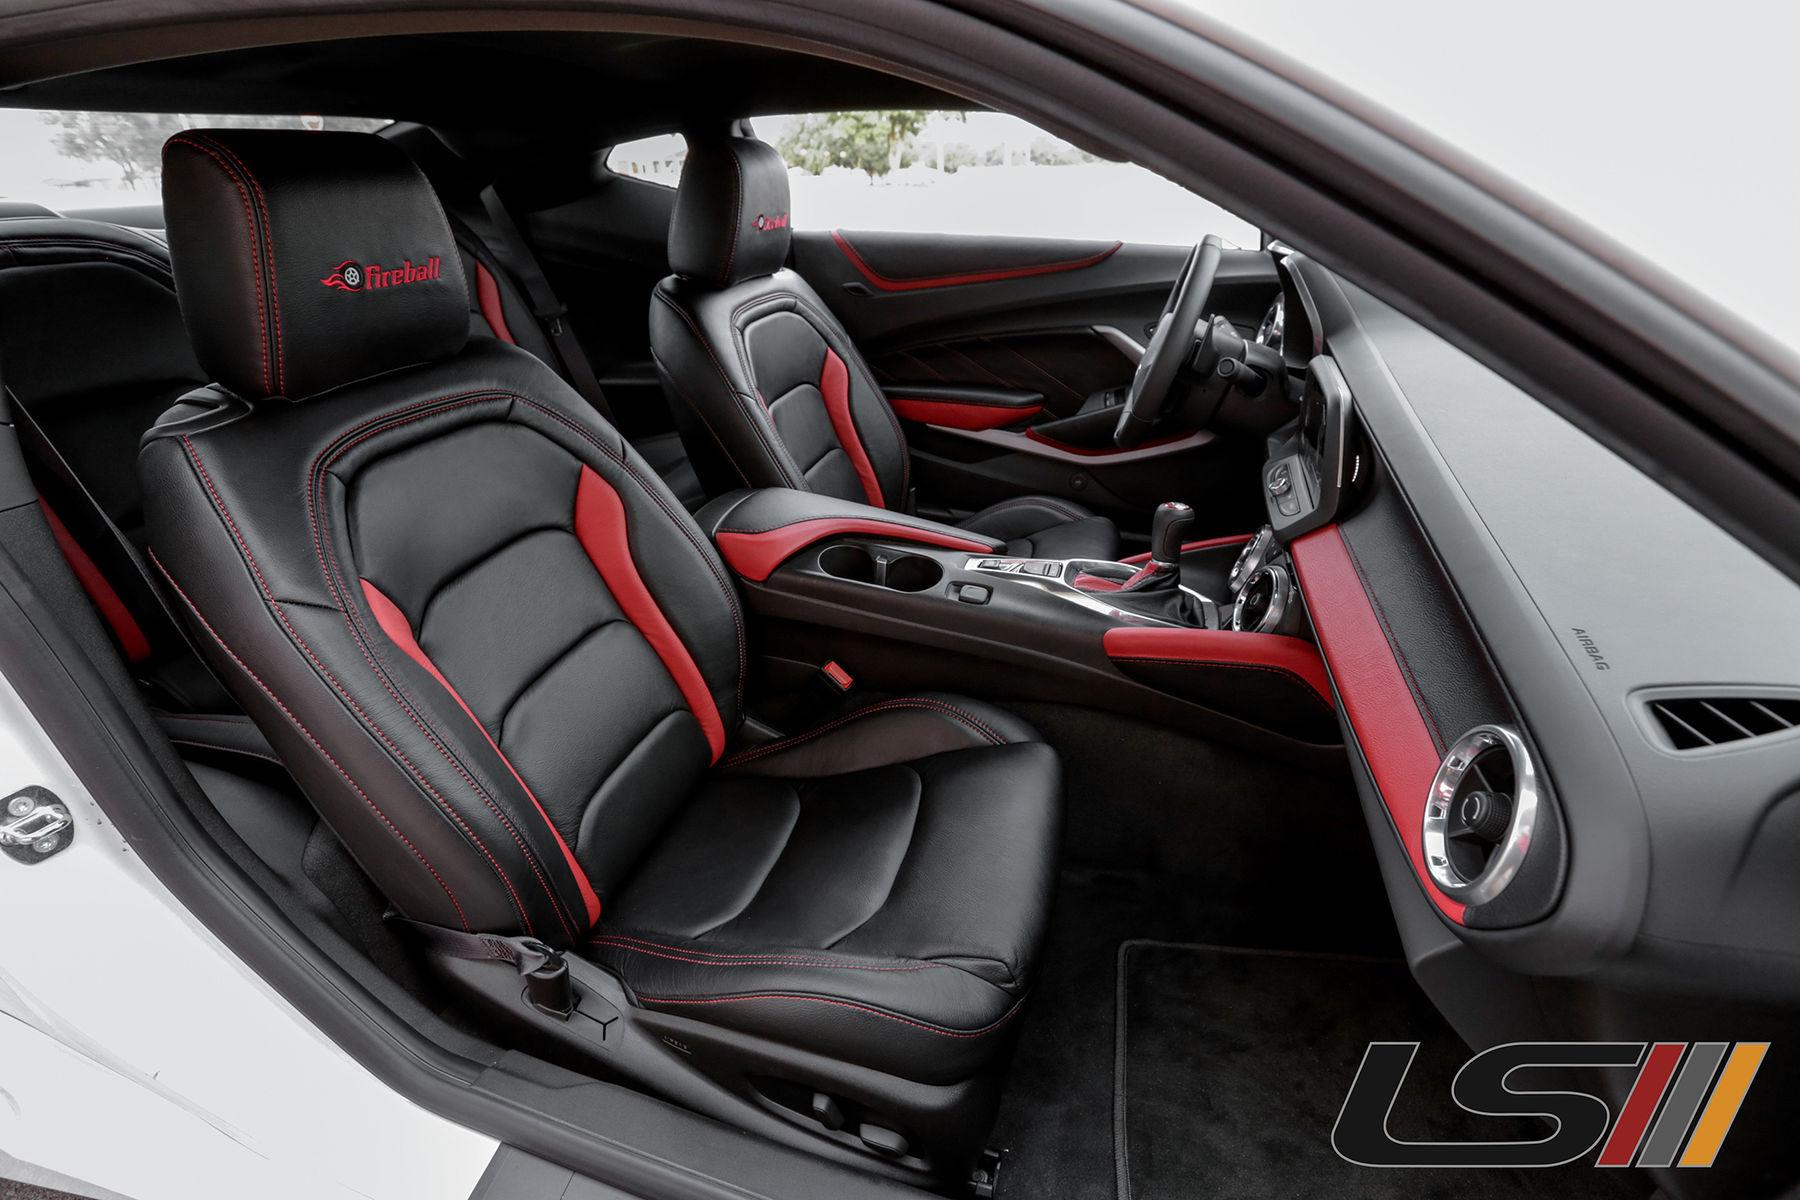 2016 Chevrolet Camaro | 2016 Chevrolet Camaro SS Interior By  LeatherSeats.com